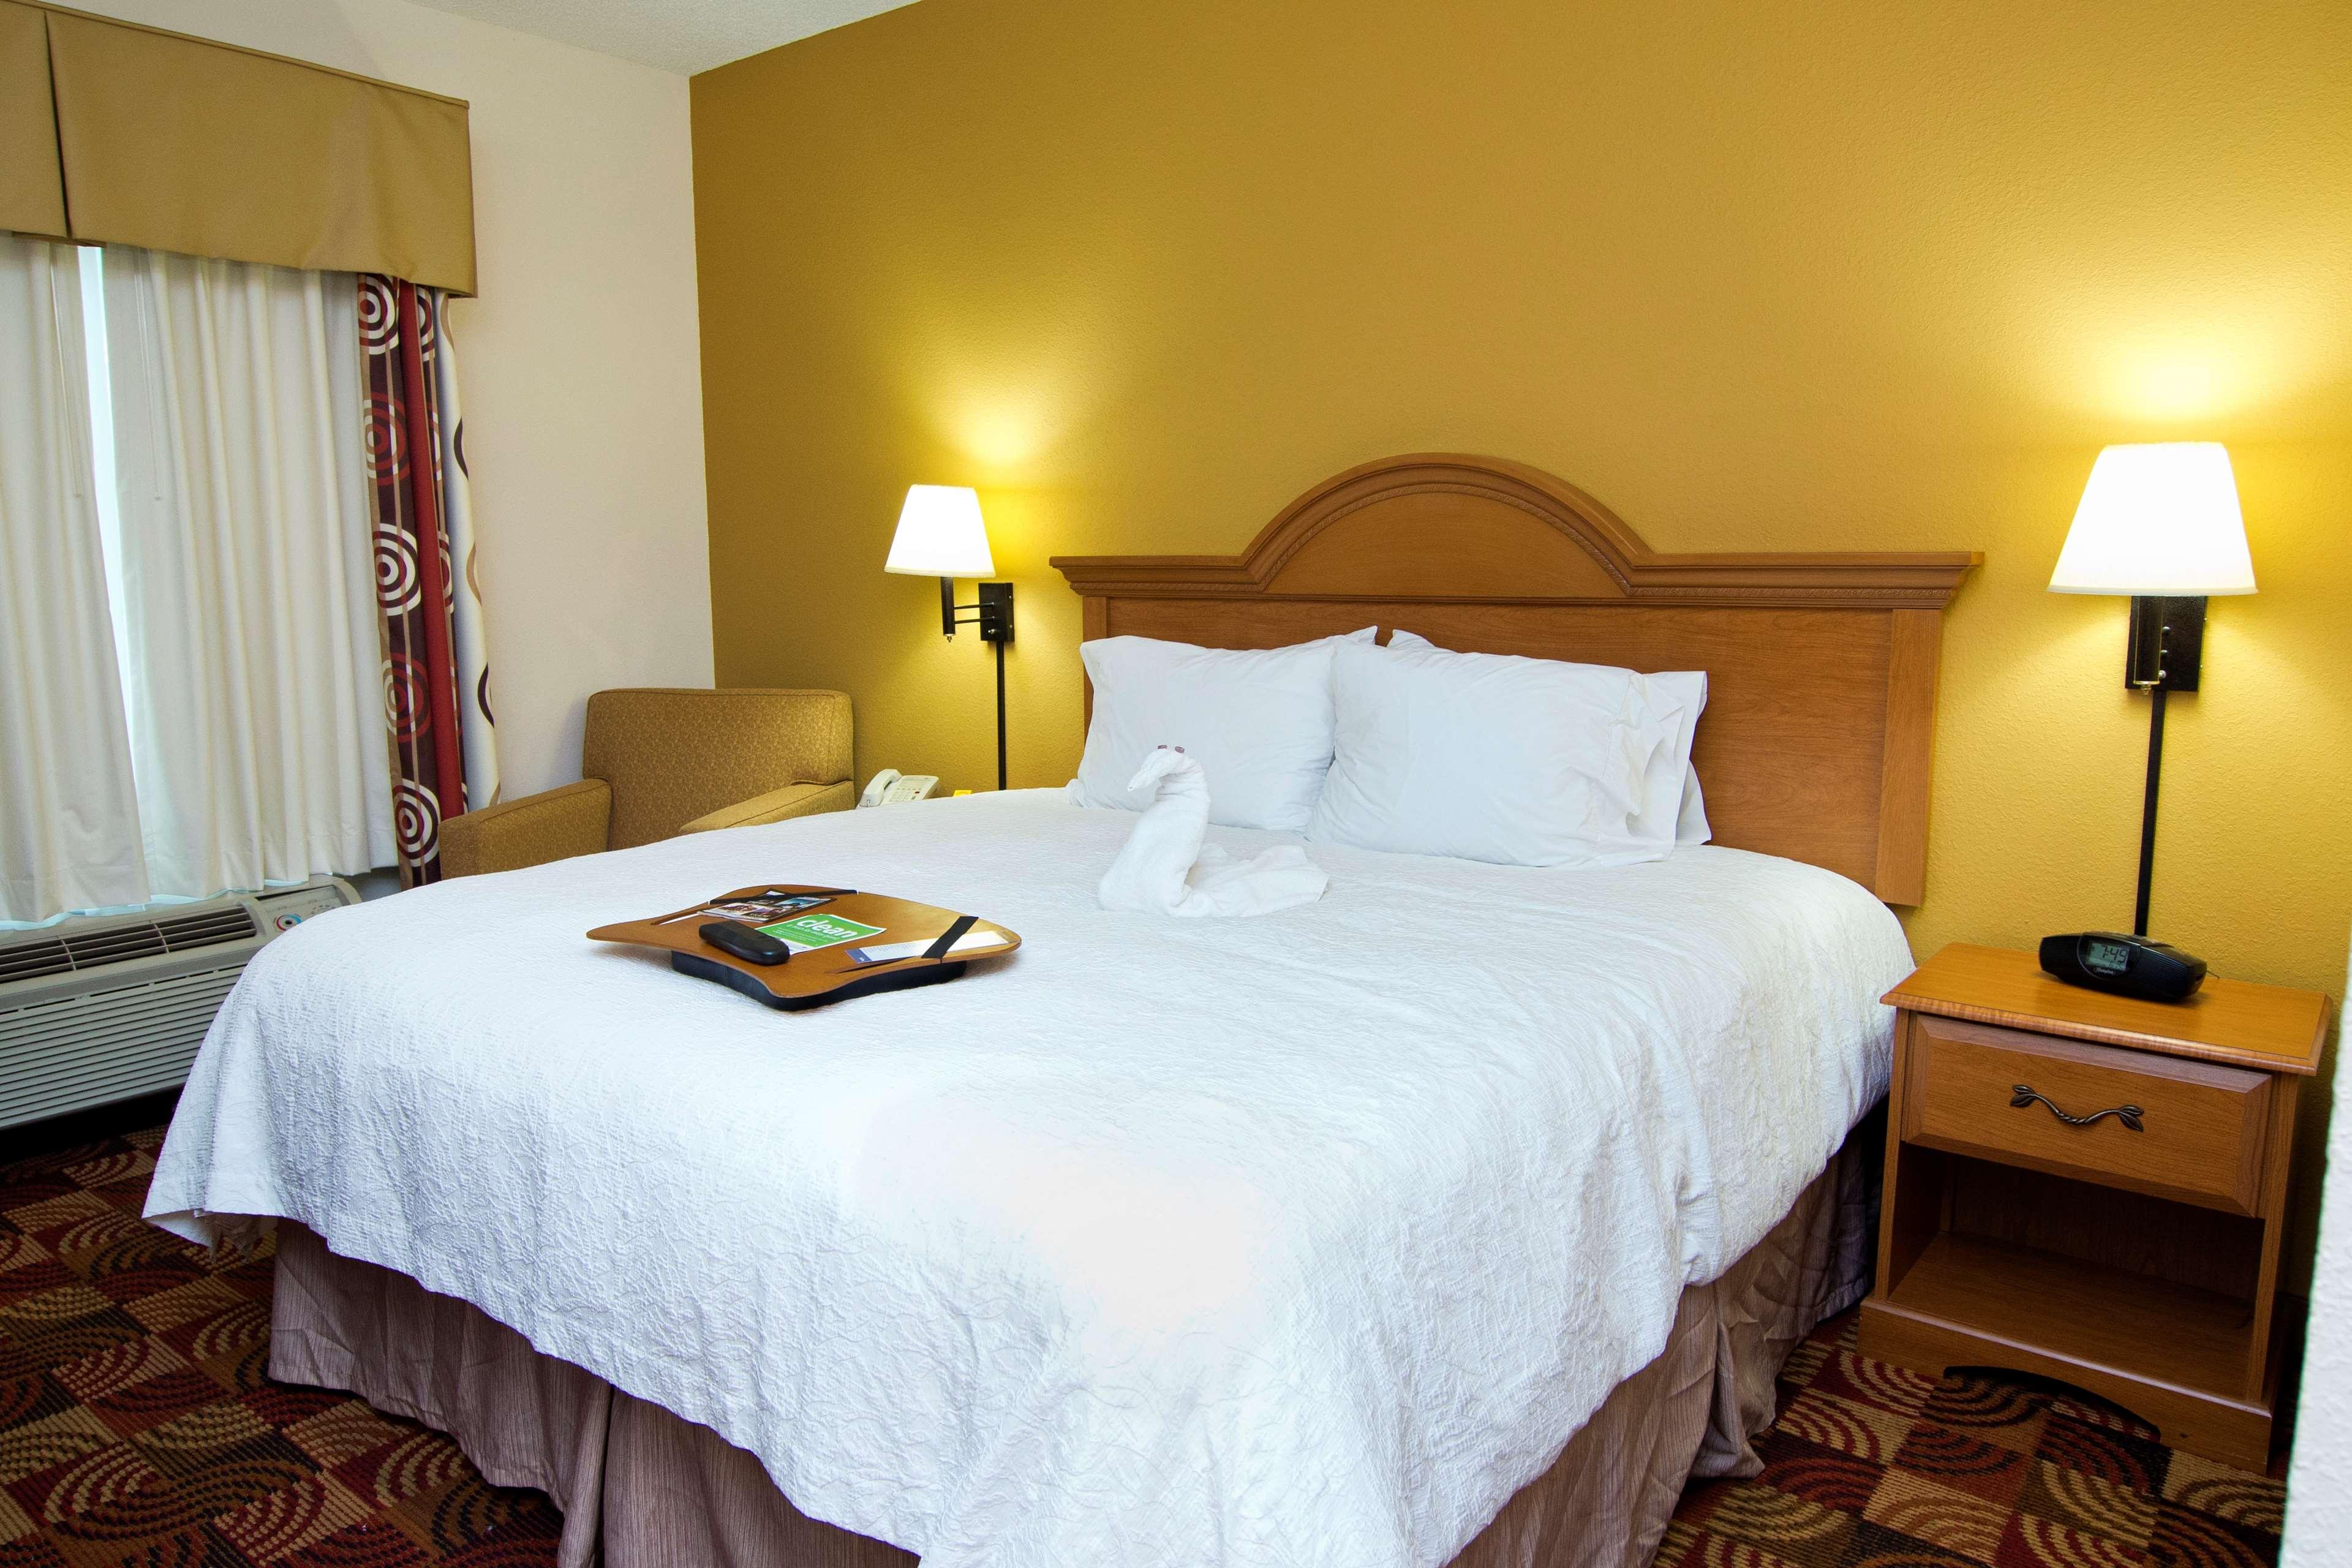 Hampton Inn & Suites Orlando Intl Dr N image 17